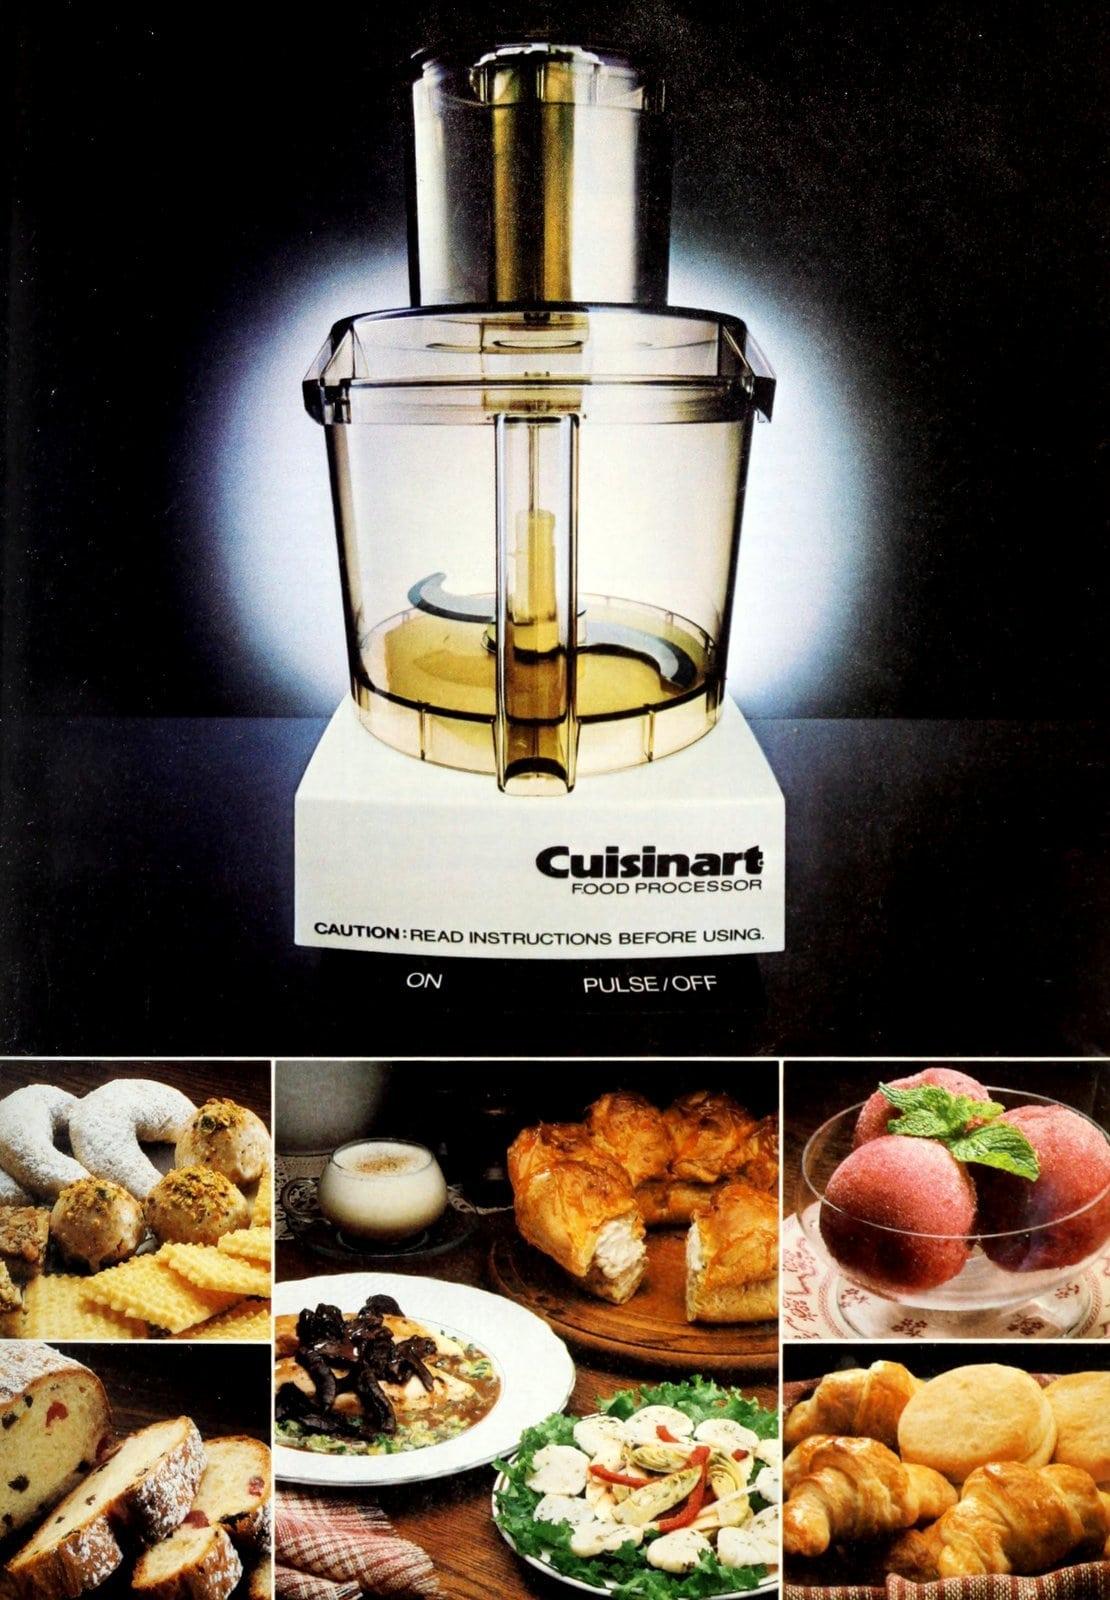 Vintage Cuisinart food processor (1983)